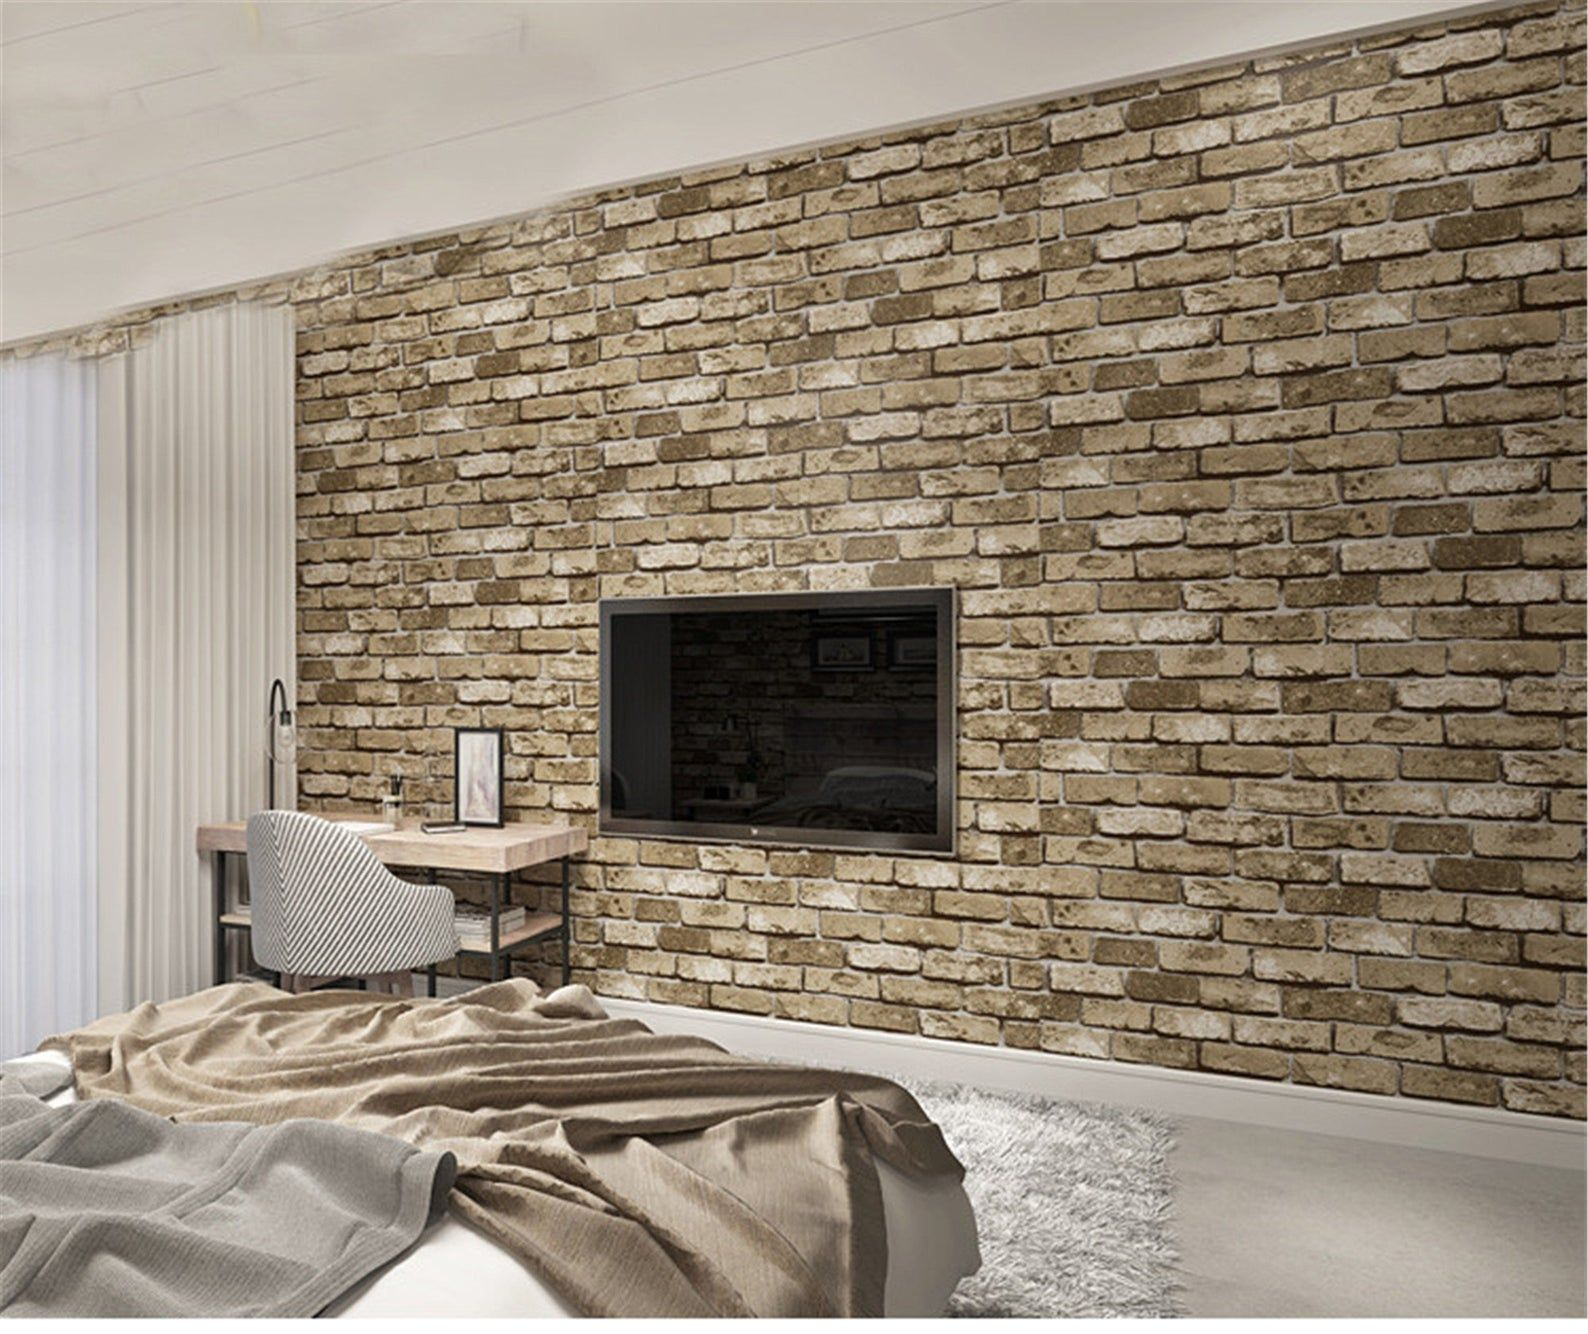 Modern Vintage Brick Textured Wallpaper For Walls Decor